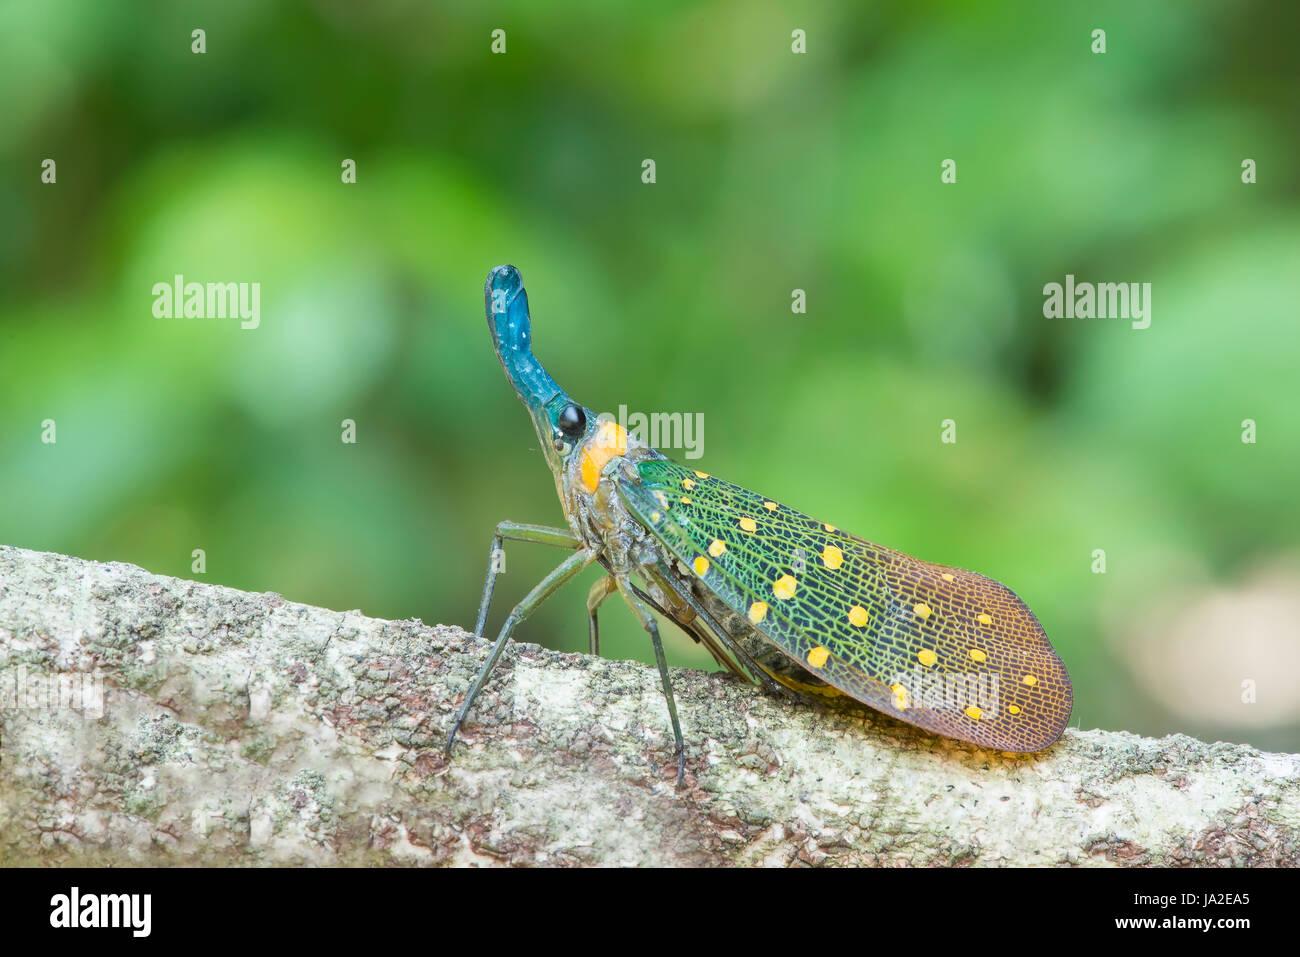 lantern bug . pyrops whiteheadi species from sabah, malaysia. - Stock Image